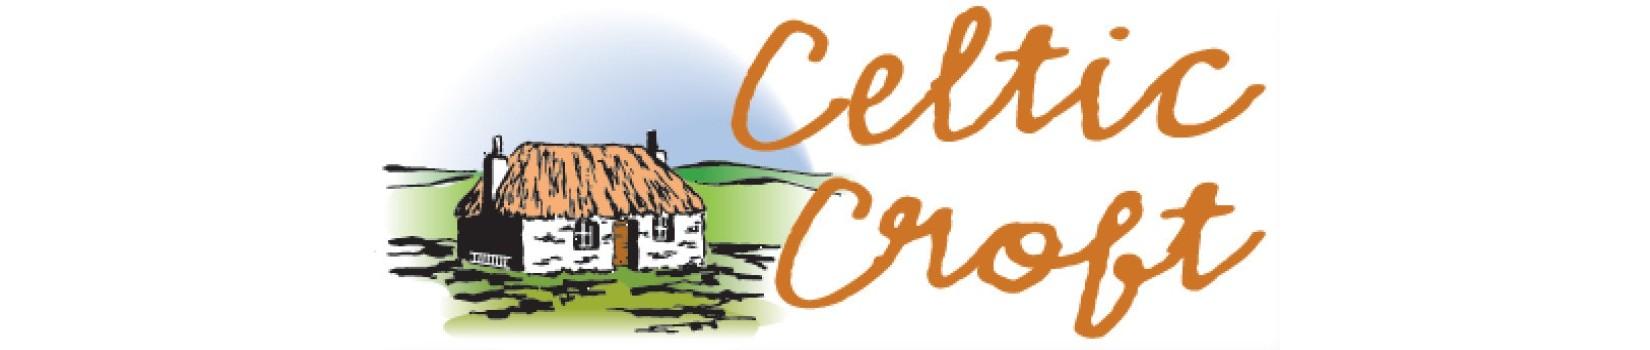 CelticCroft